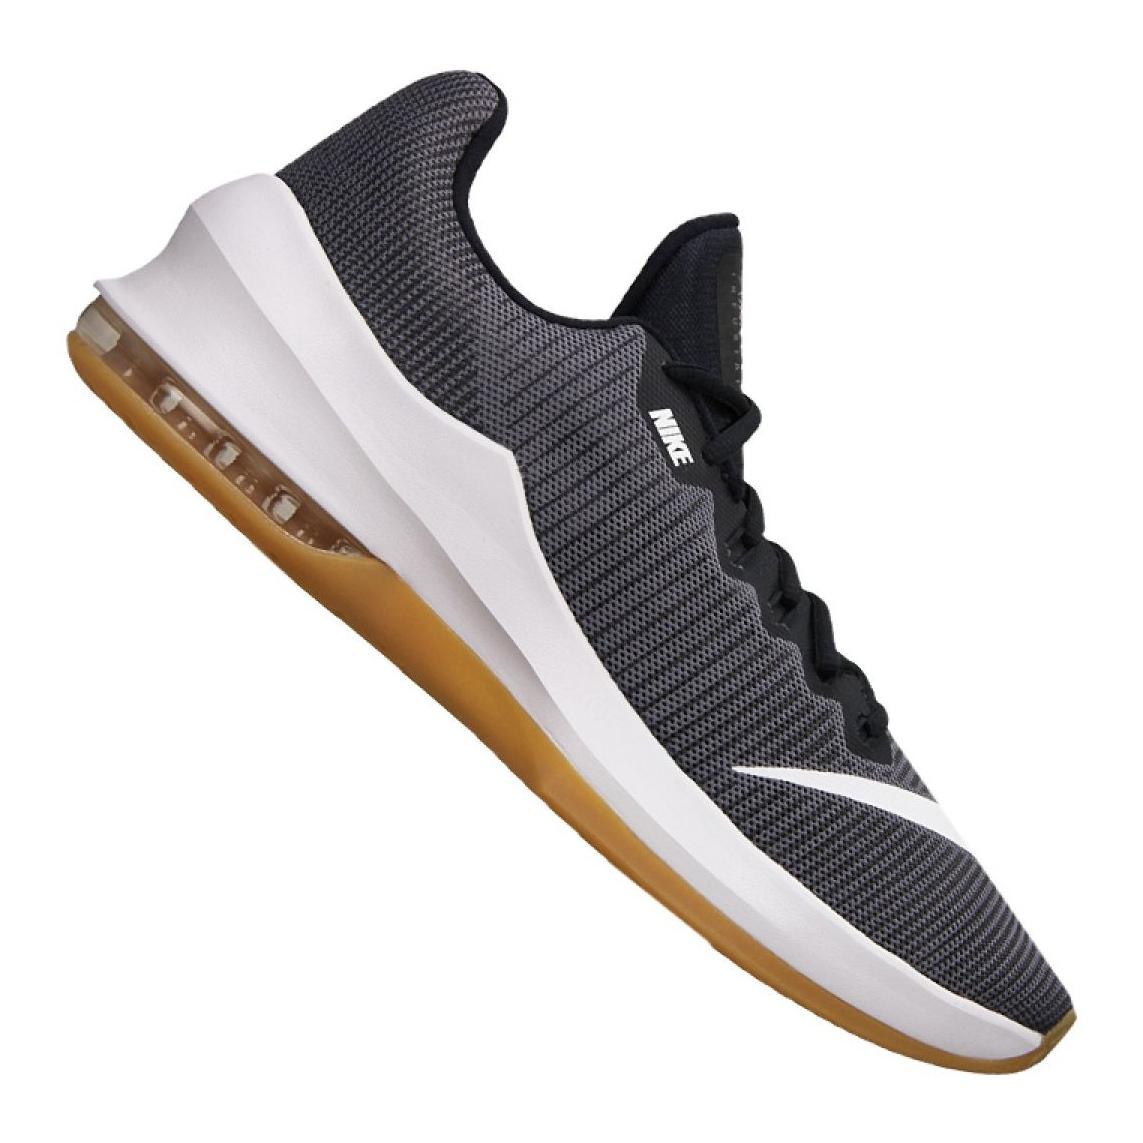 Nike Air Max Infuriate 2 Alacsony M 908975 042 fekete fehér, fekete